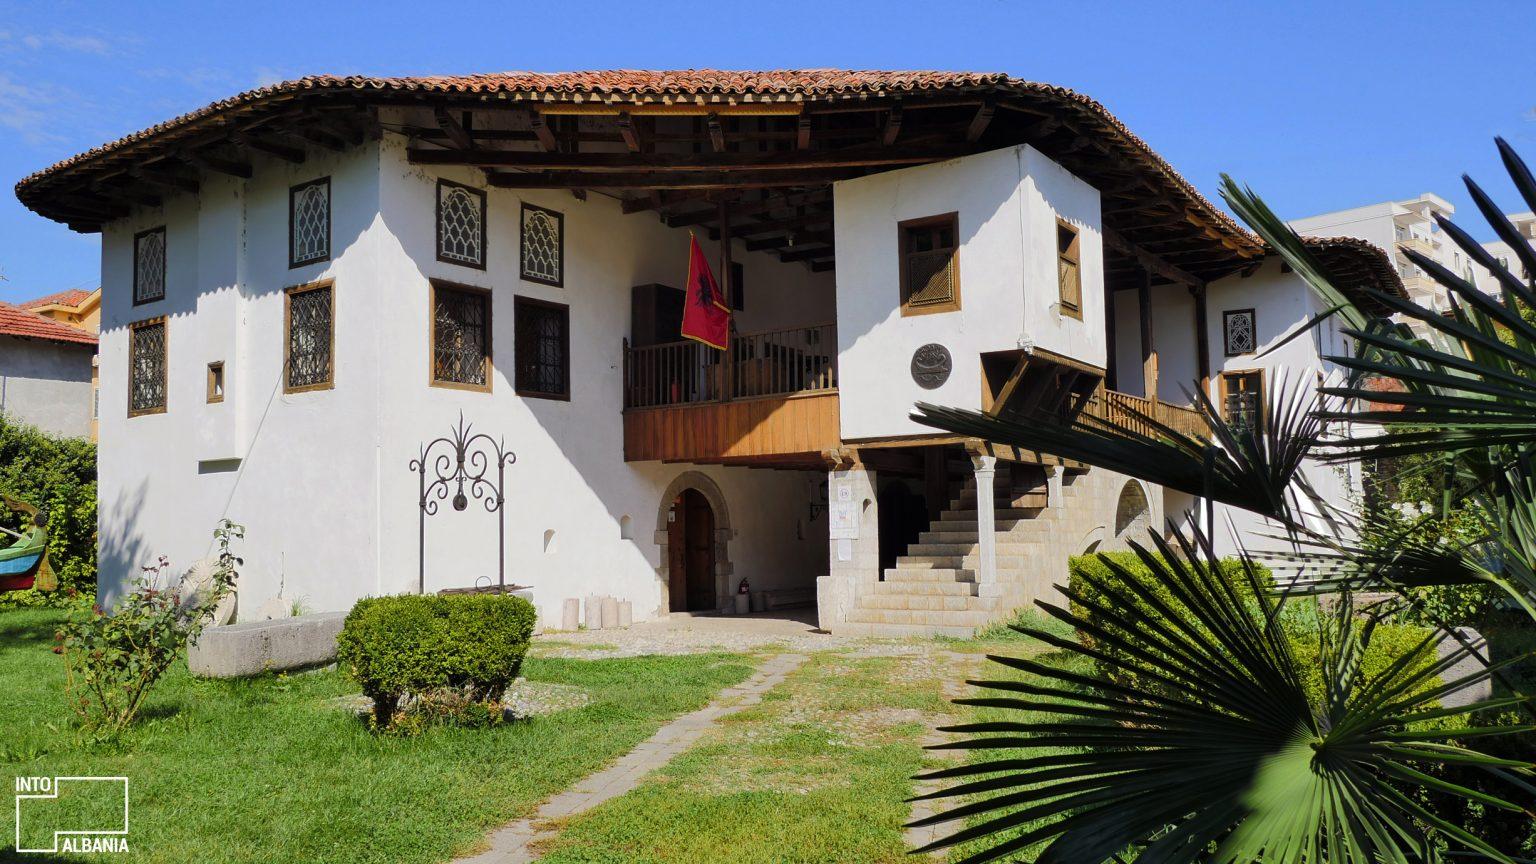 House of Oso Kuka, Shkodra, photo by IntoAlbania.